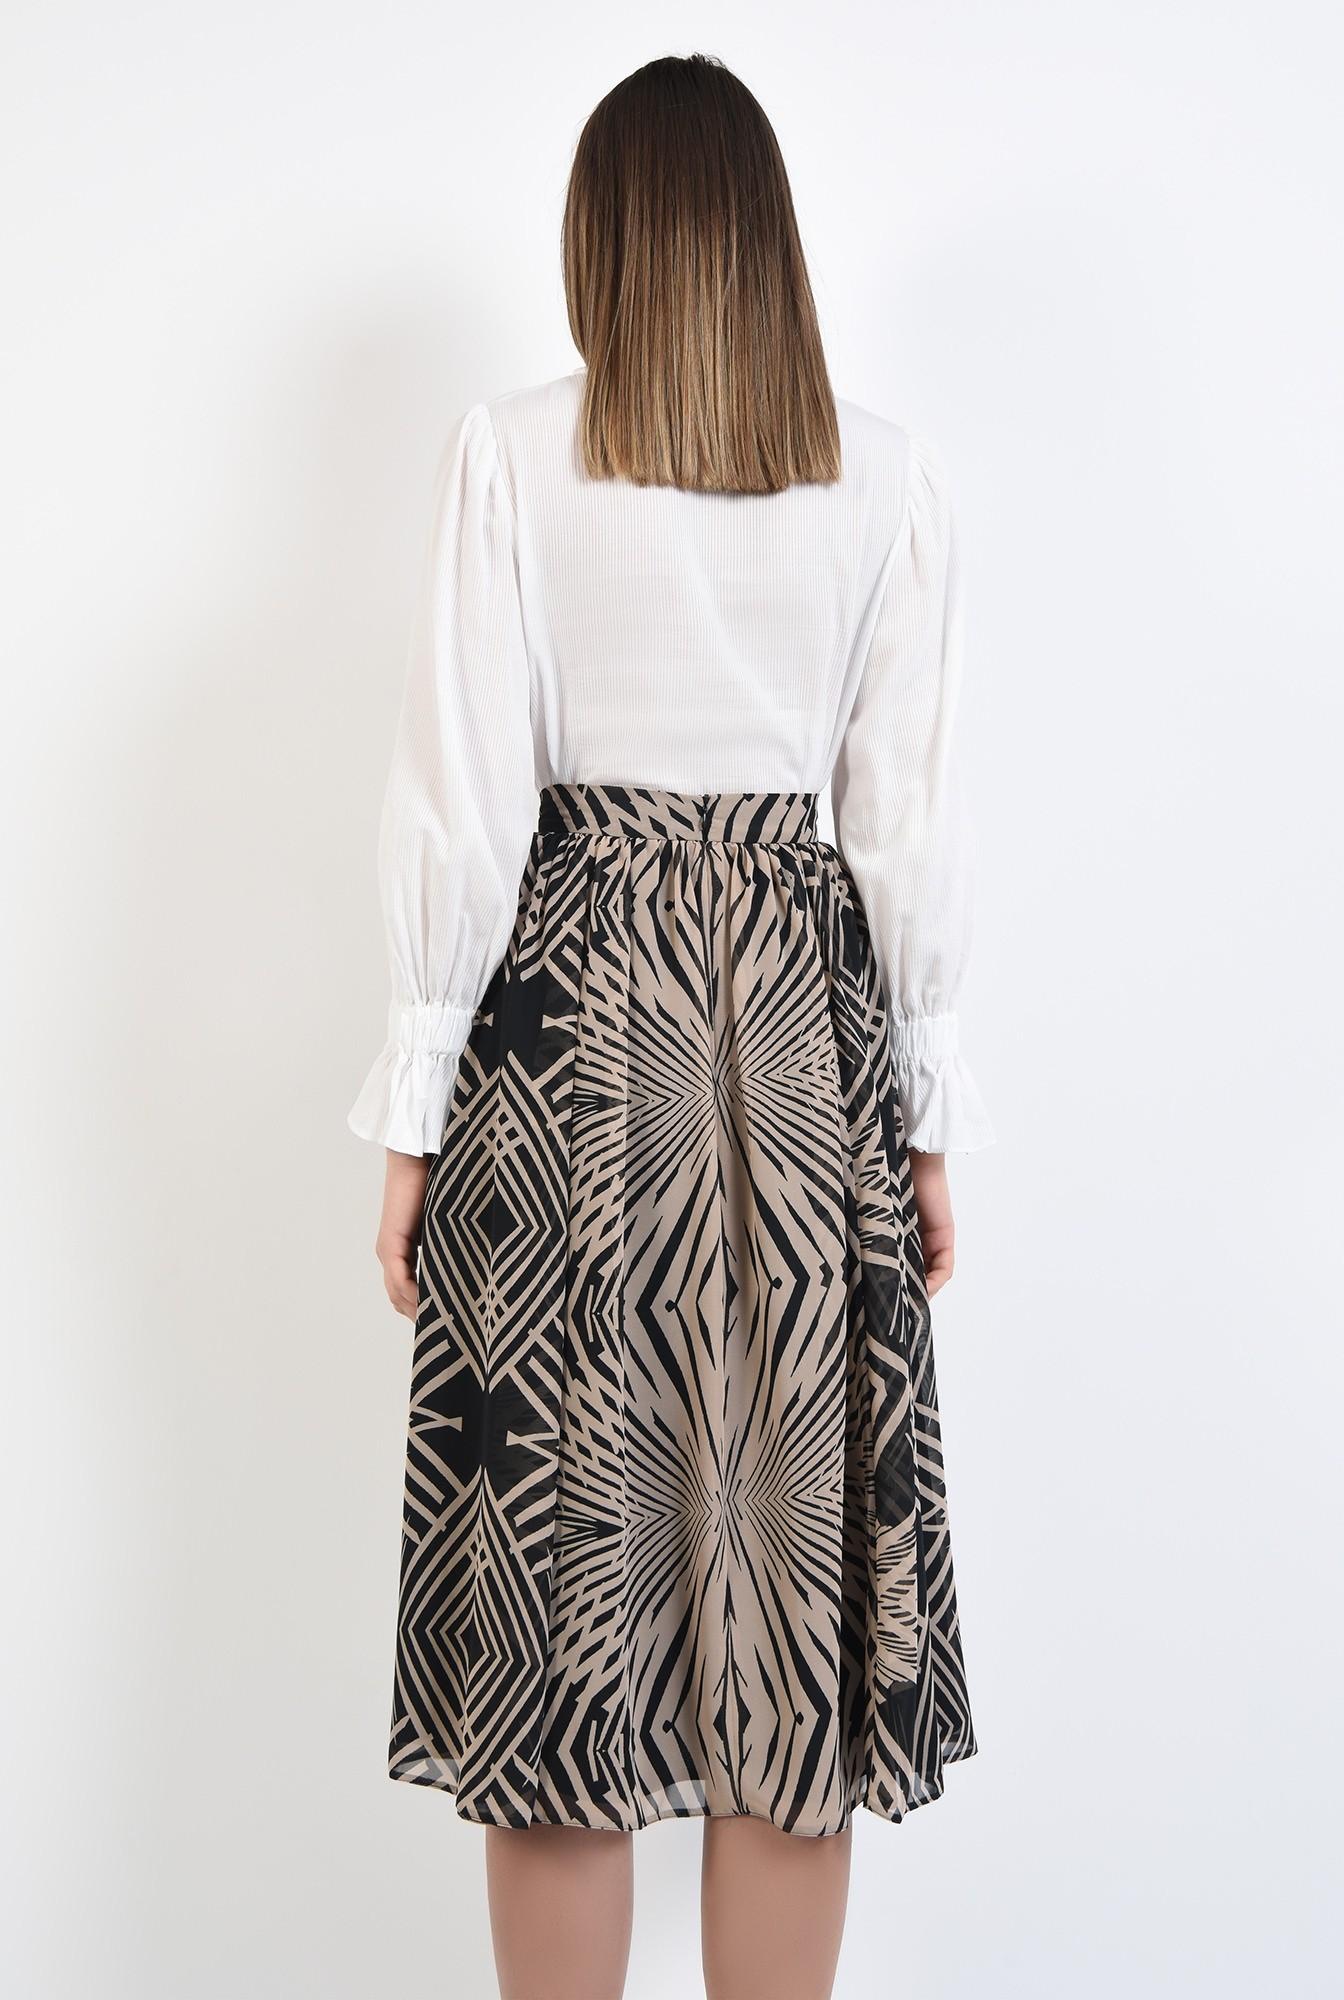 1 - 360 - fusta casual, midi, evazata, cu talie inalta, imprimeu abstract